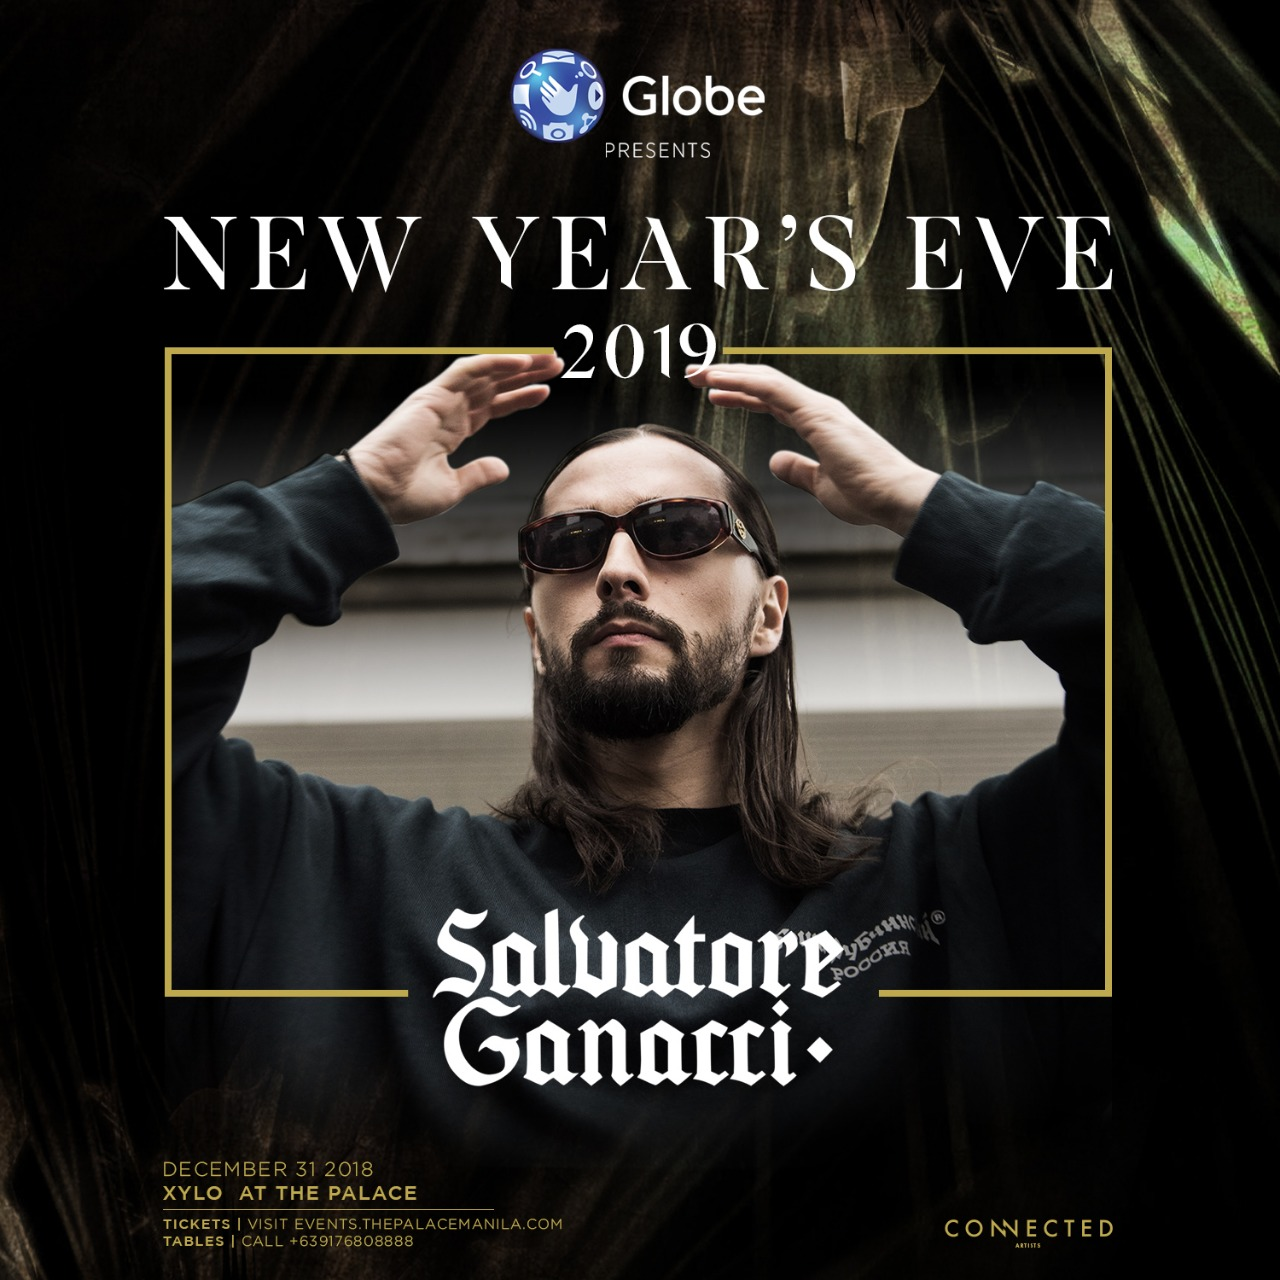 XYLO New Year's Eve Ball with Salvatore Ganacci